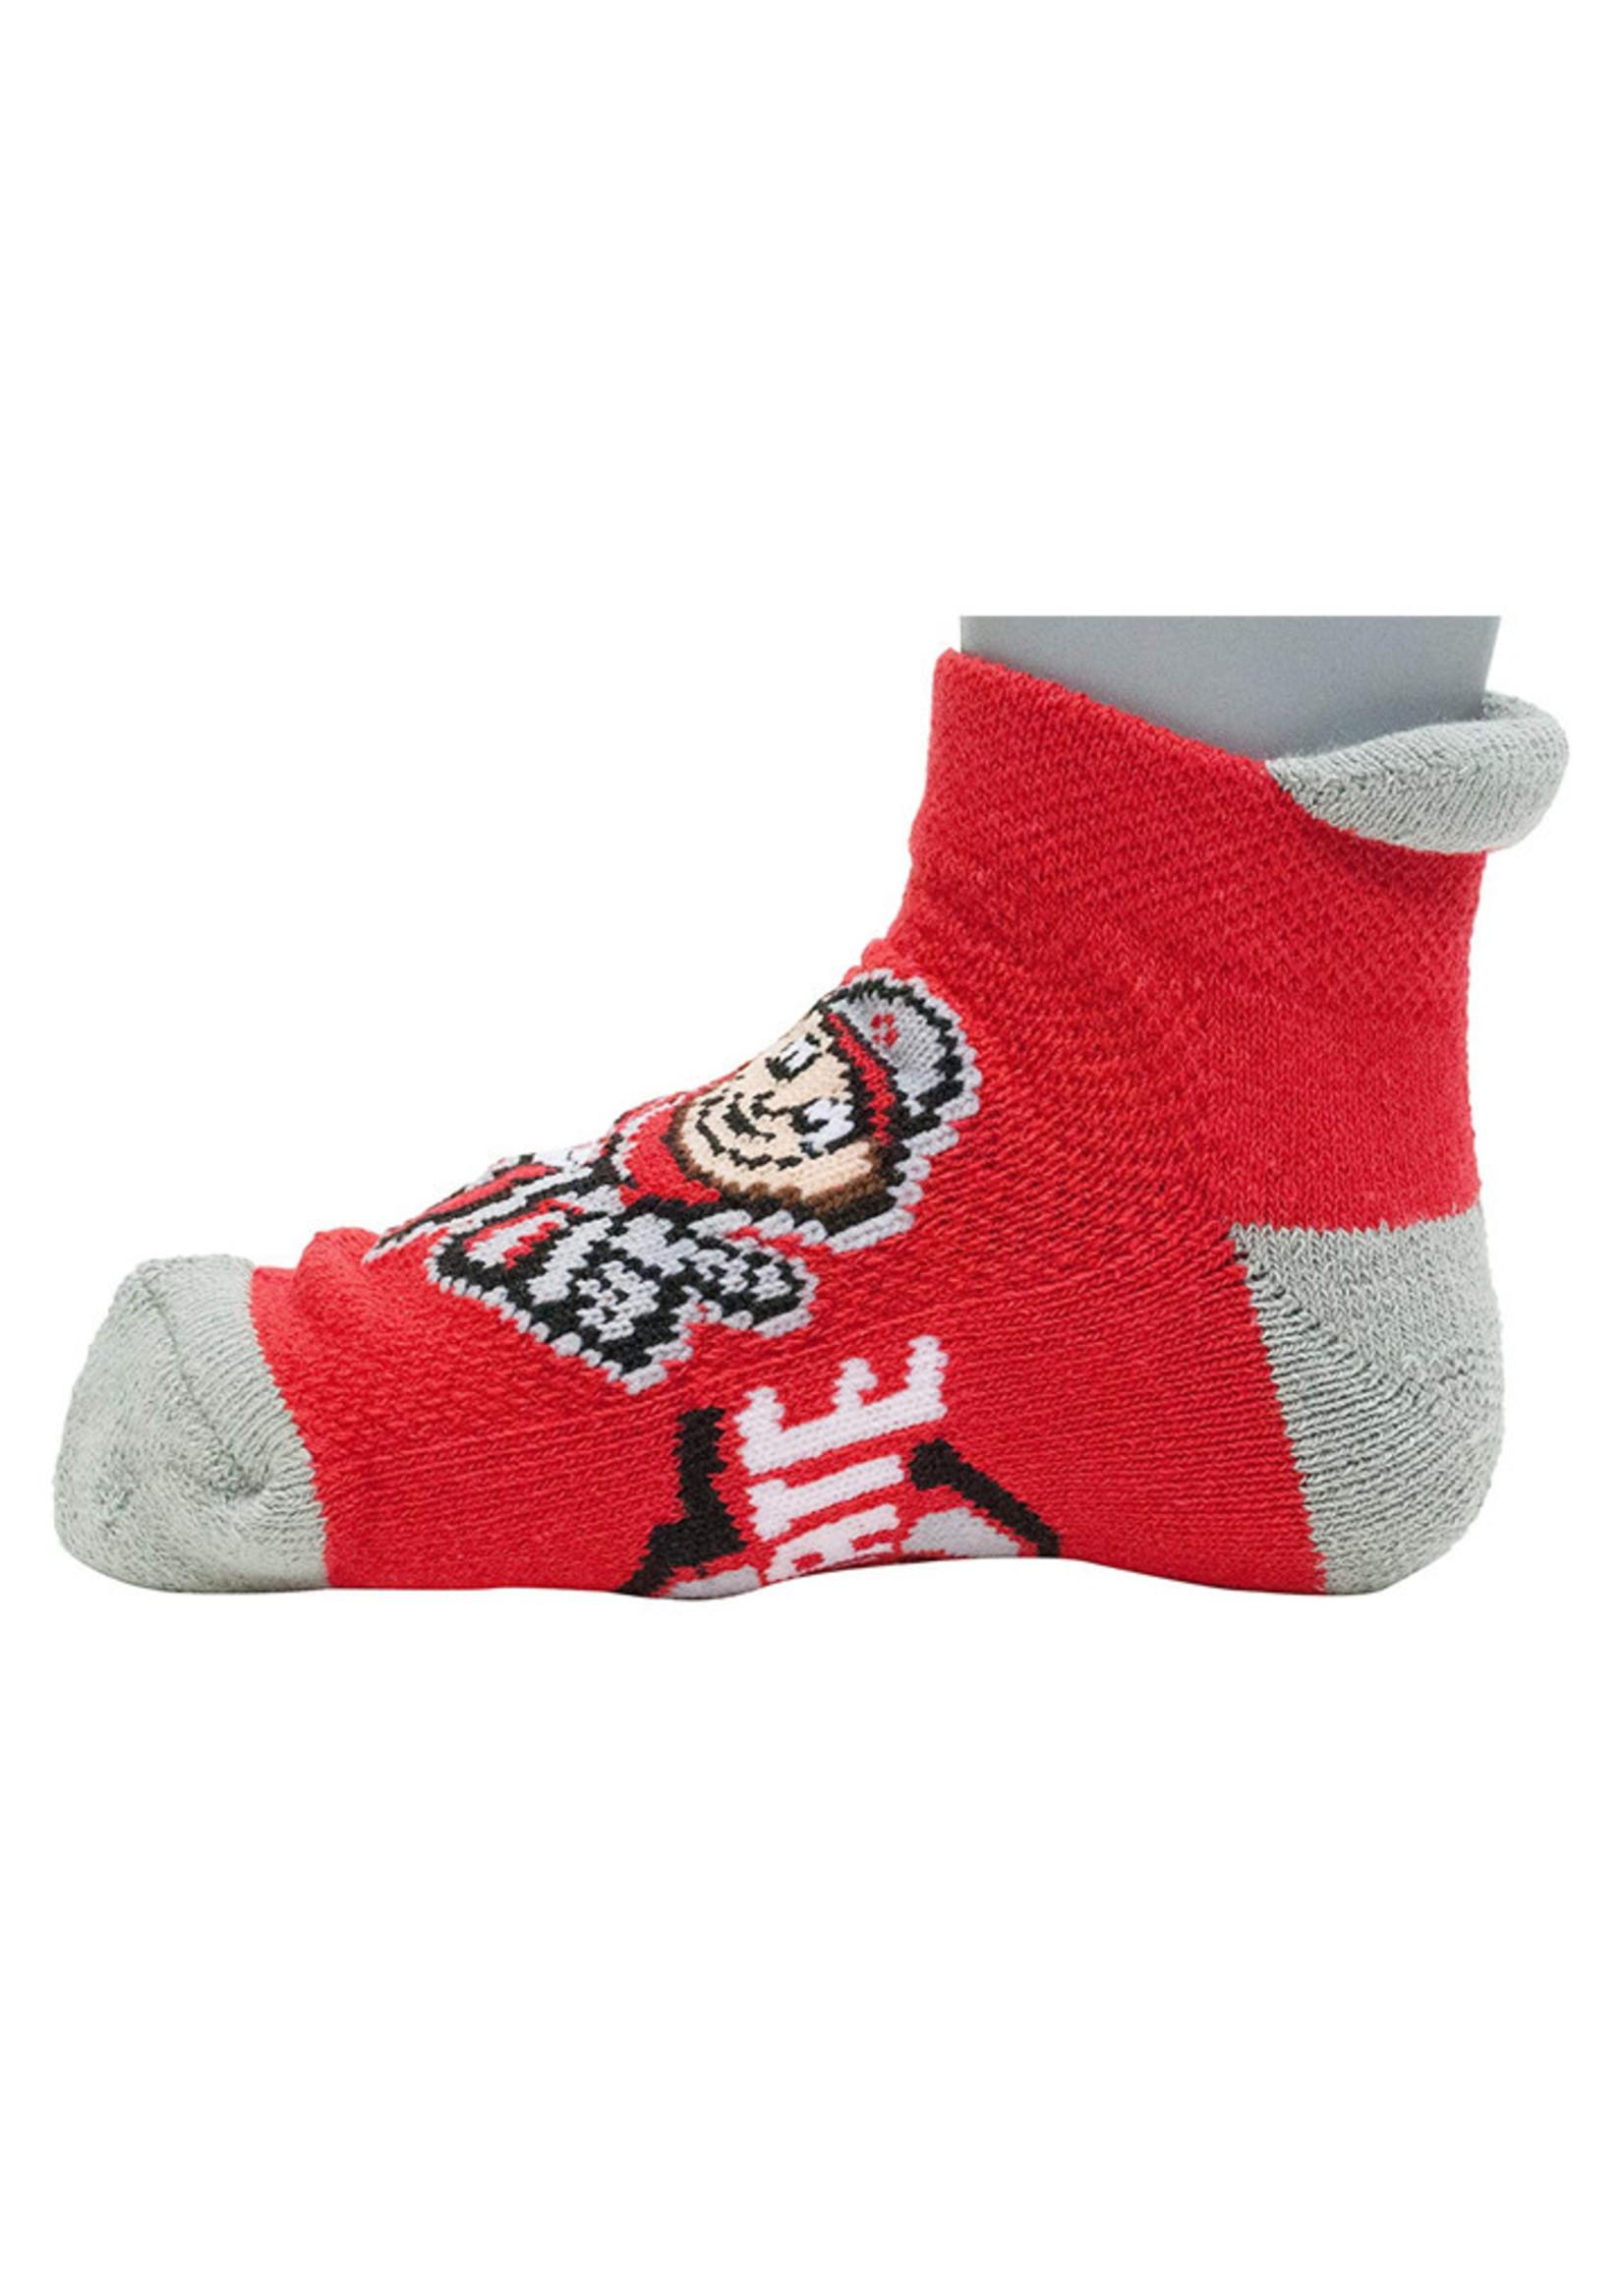 Ohio State Buckeyes Youth 3-5 Socks - Red